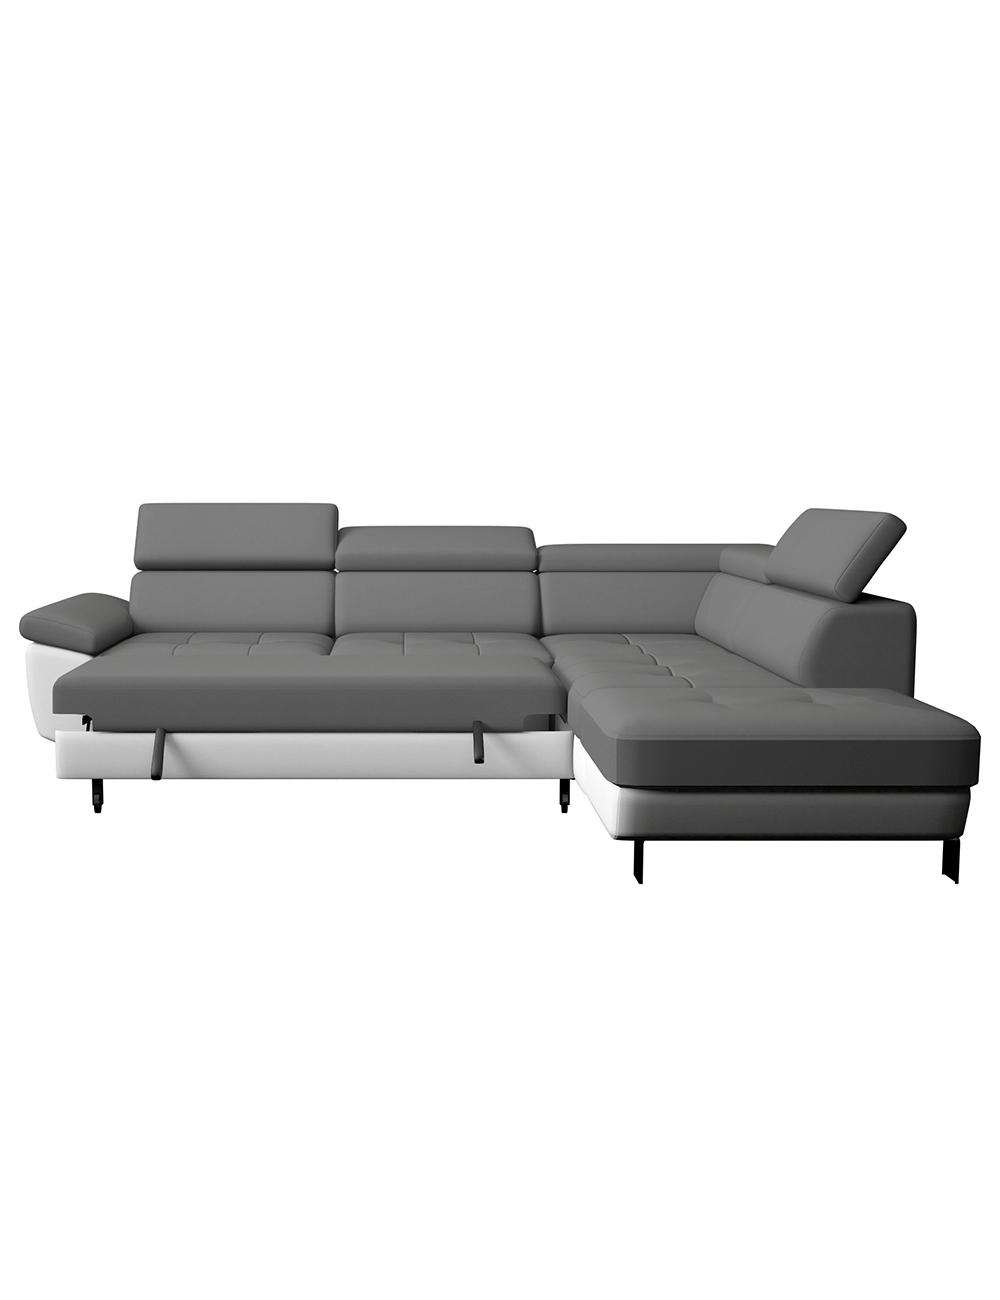 schlaf ecksofa kate grau weiss. Black Bedroom Furniture Sets. Home Design Ideas